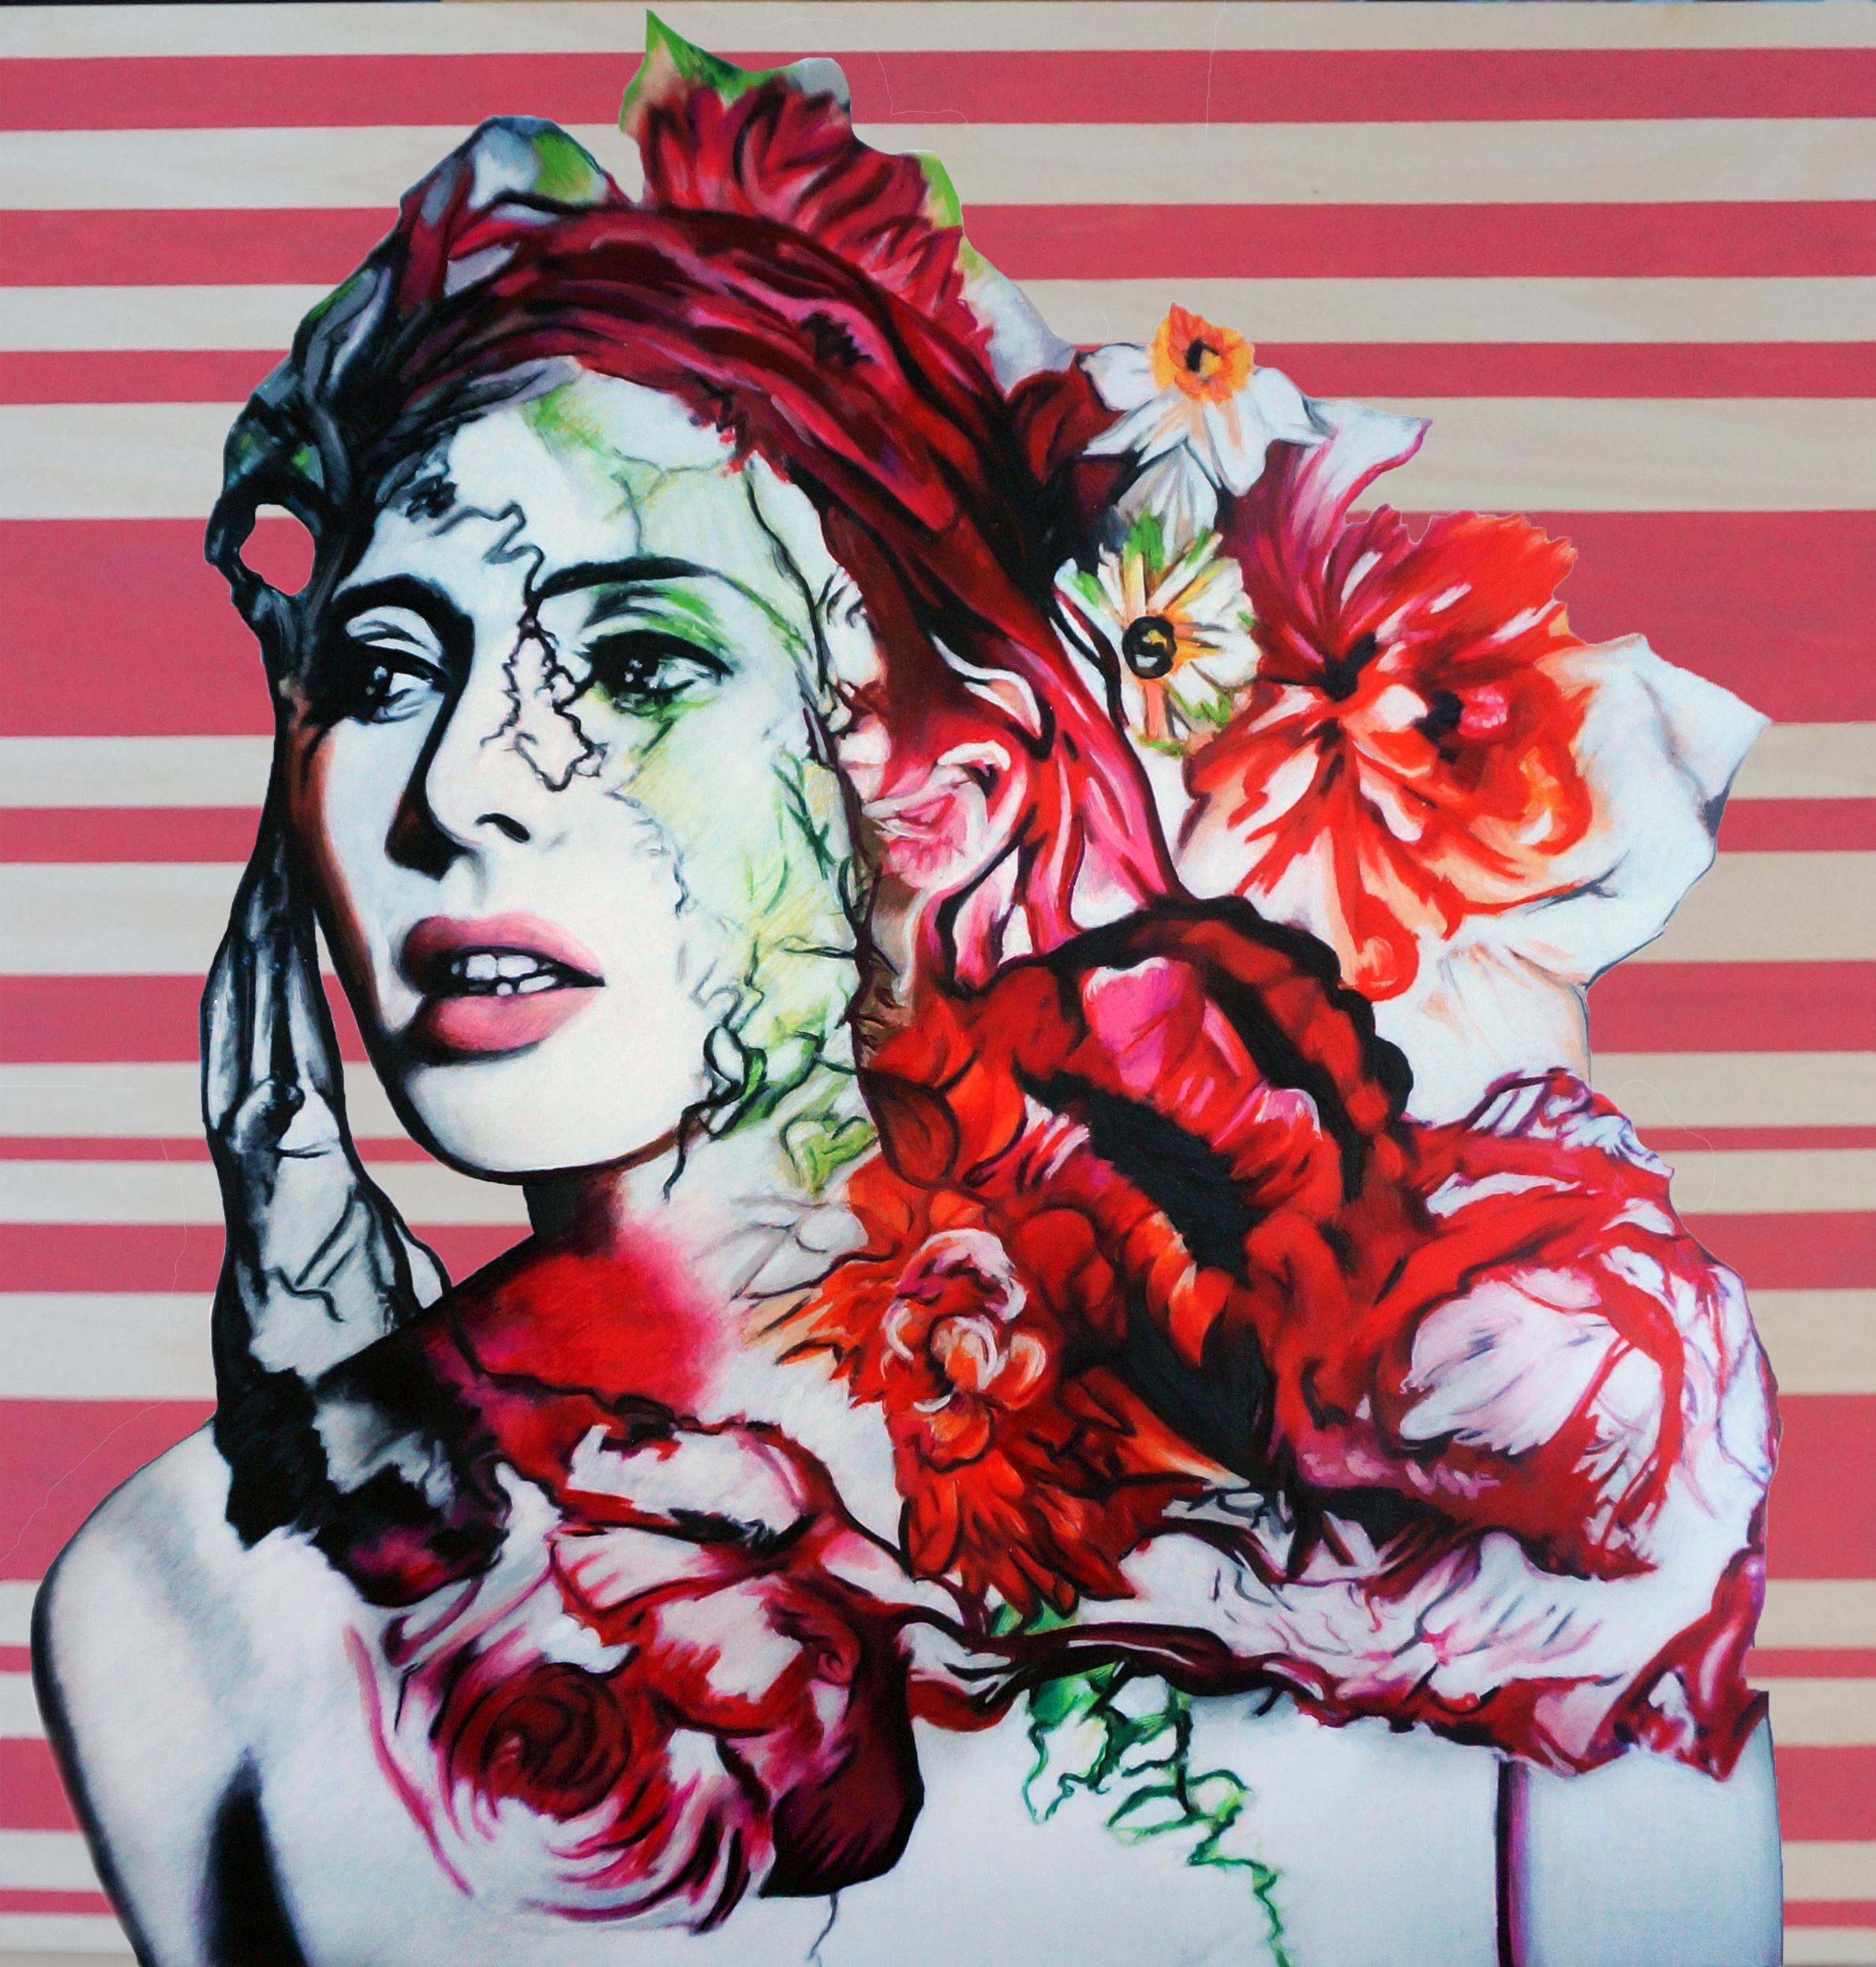 "Wildflowers, 2018, mixed media, 30 x 30""."